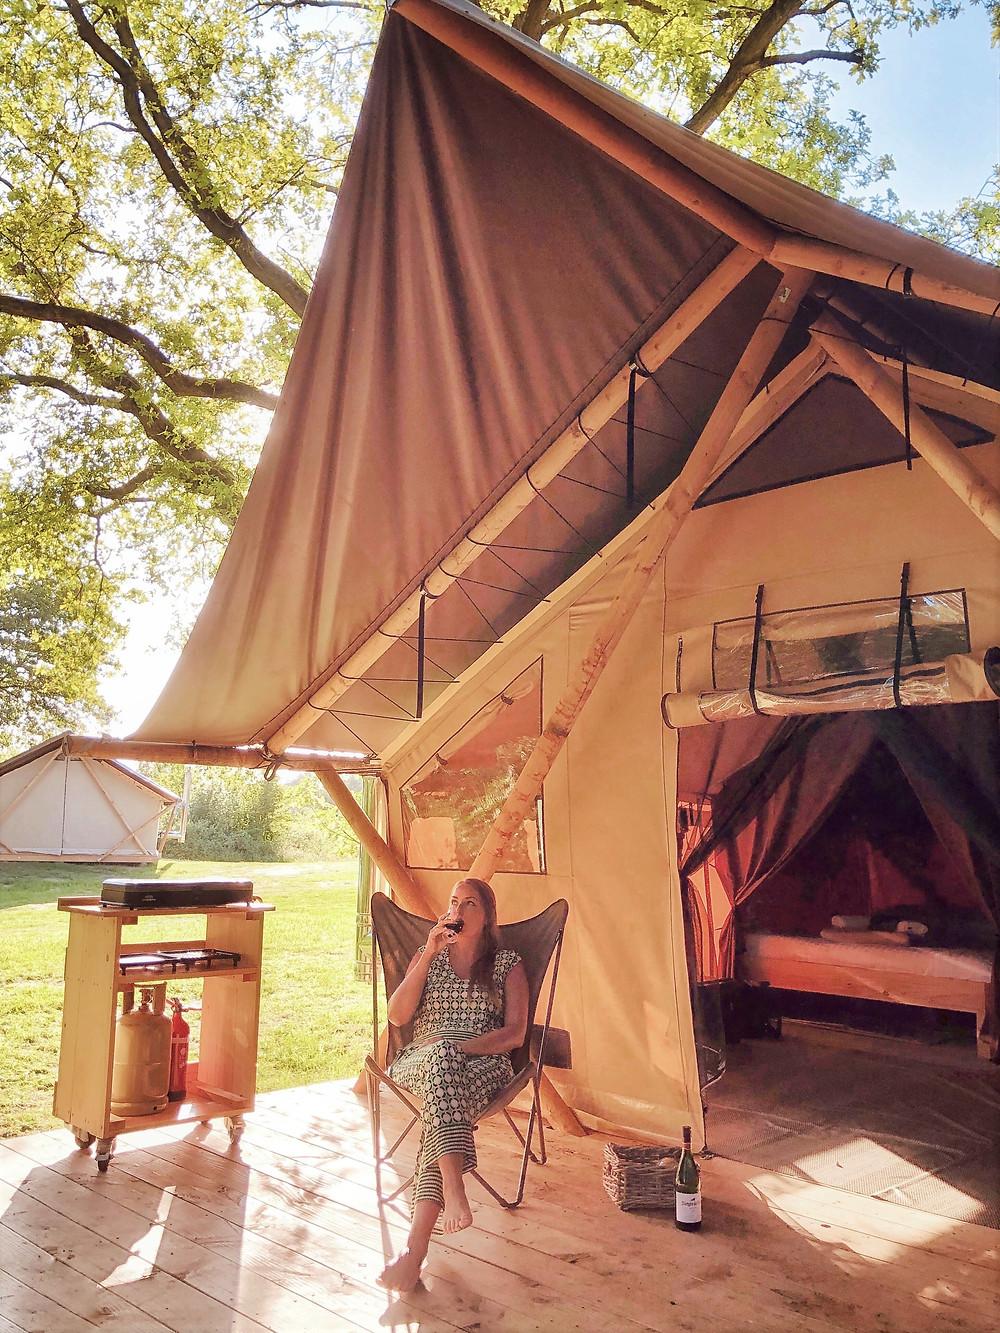 Trappeur glamping tent Huttopia Camping de Roos in Beerze - Overijssel - the Netherlands